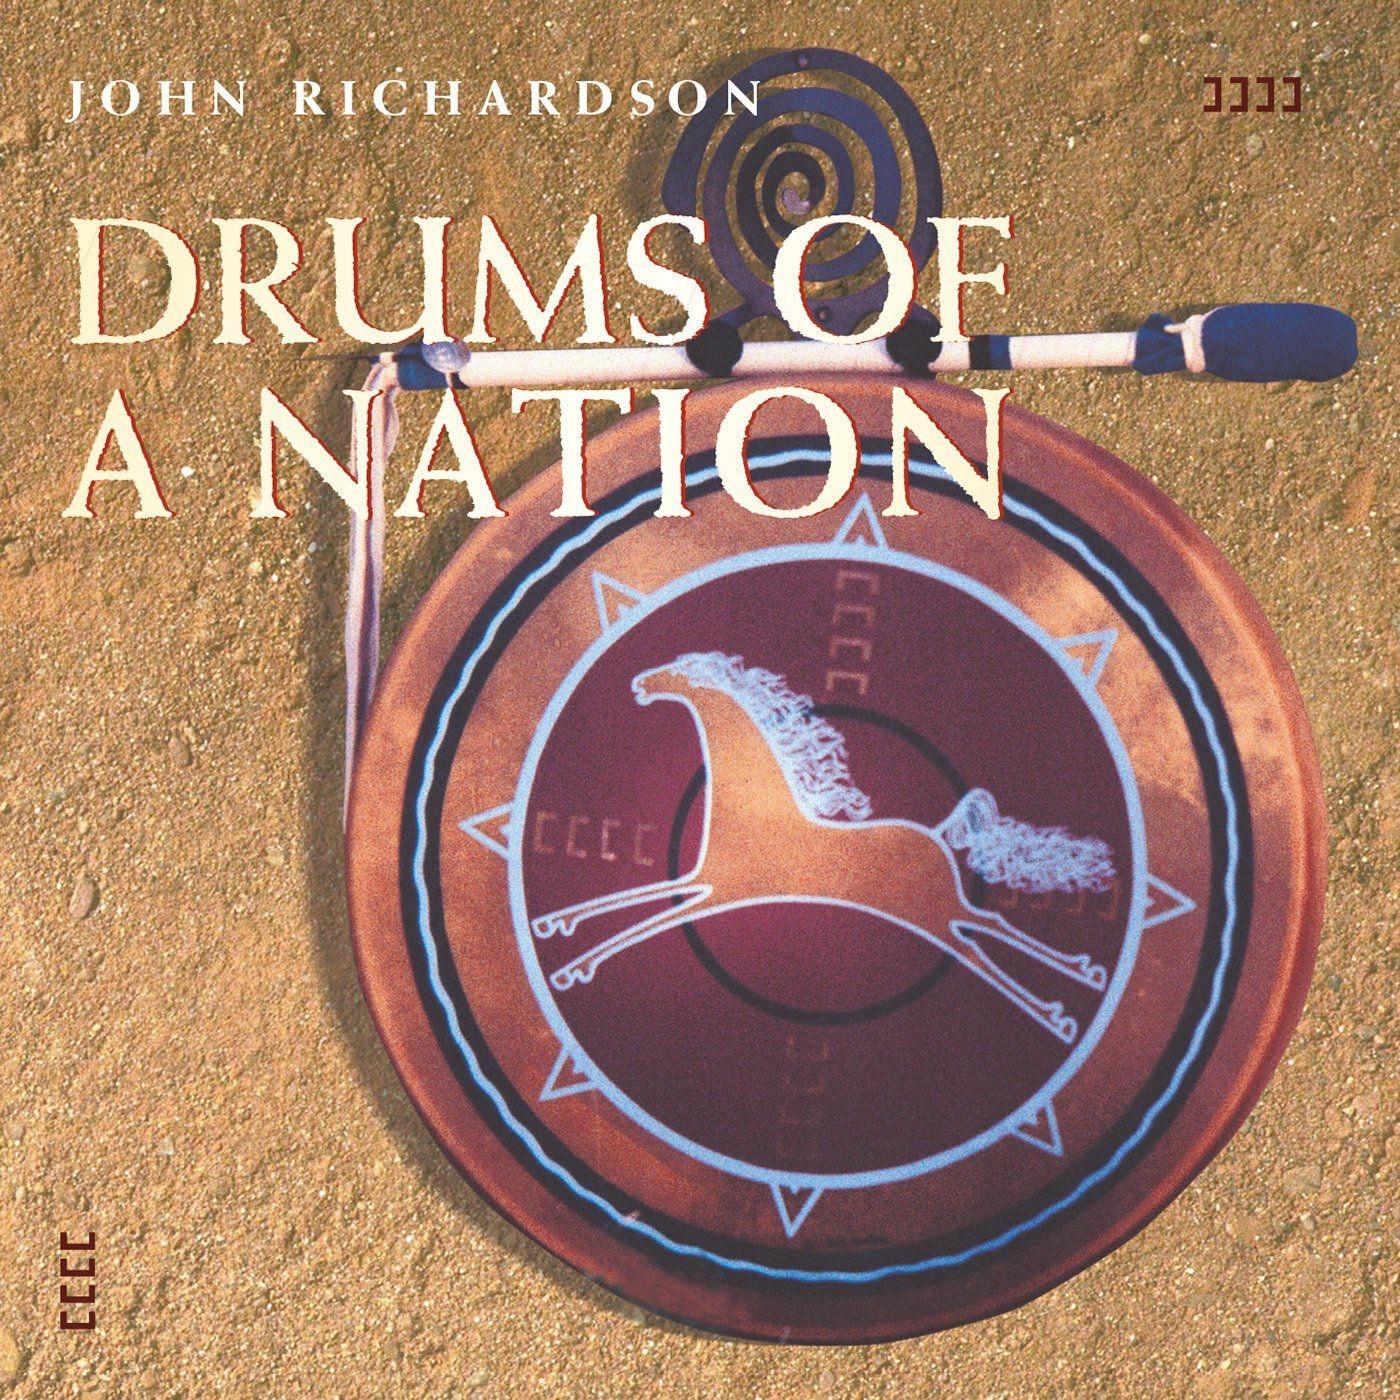 JOHN RICHARDSON: DRUMS OF A NATION [CD]